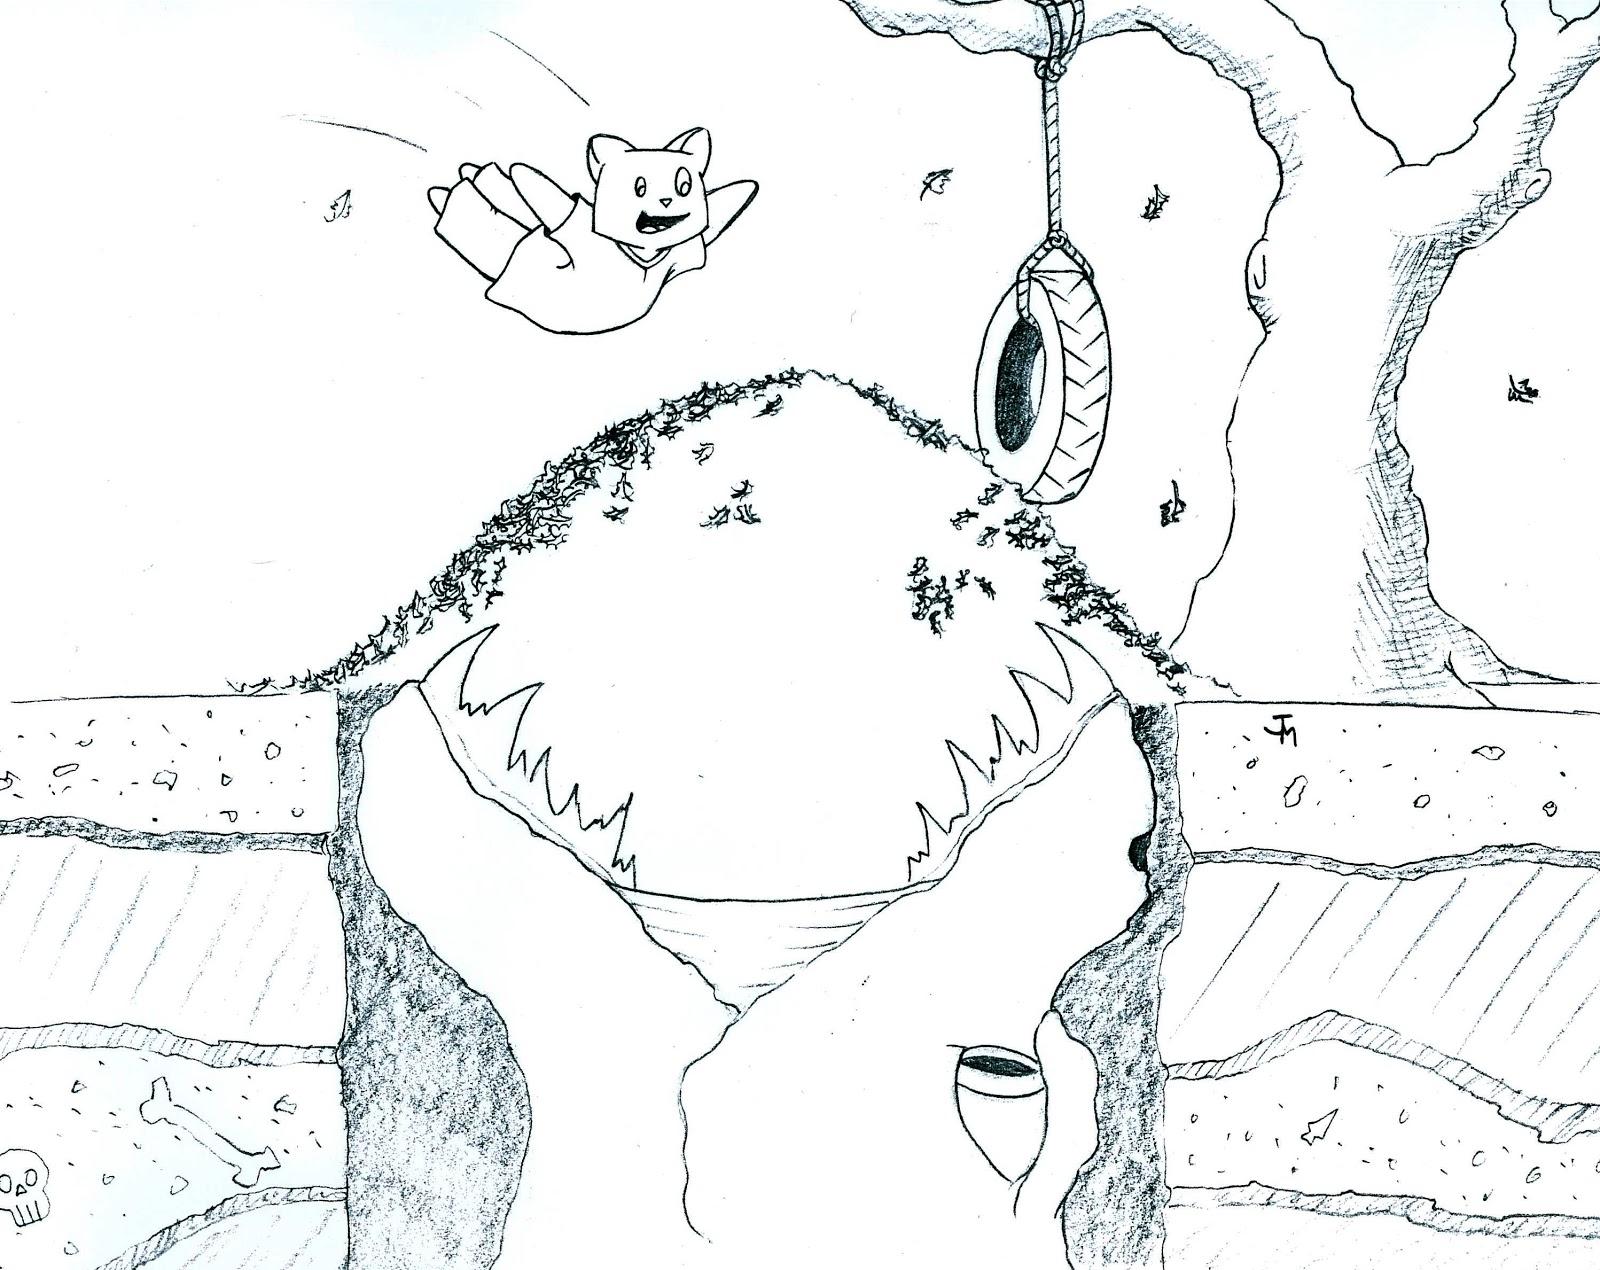 Jeff Mason S Art Blog Holiday Sketch Nov 5th Psa Beware Piles Of Leaves